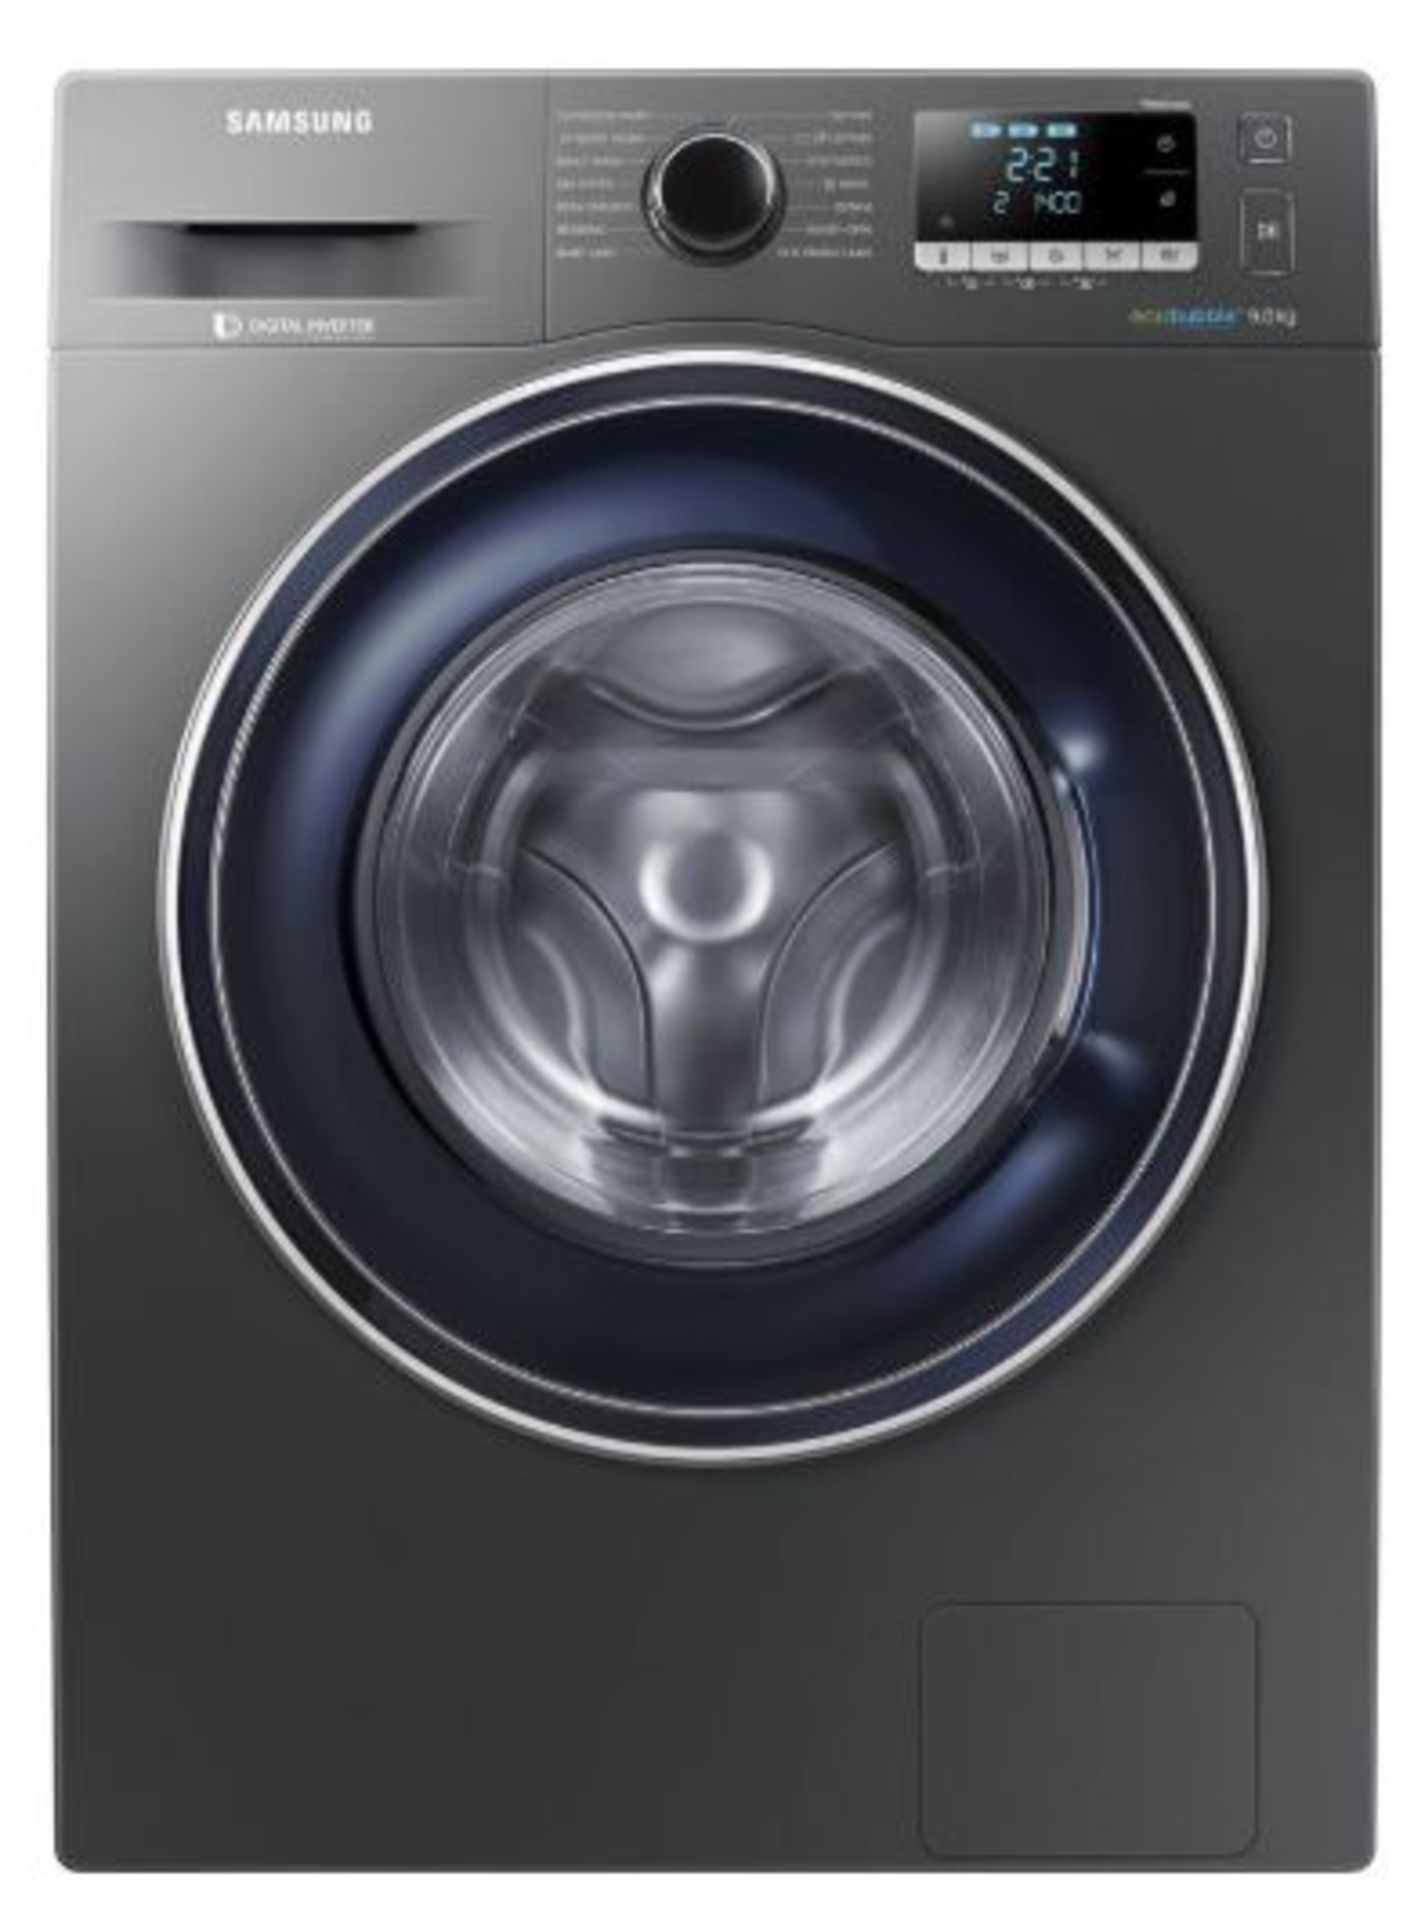 Pallet of 2 Samsung Premium Washing machines. Latest selling price £738